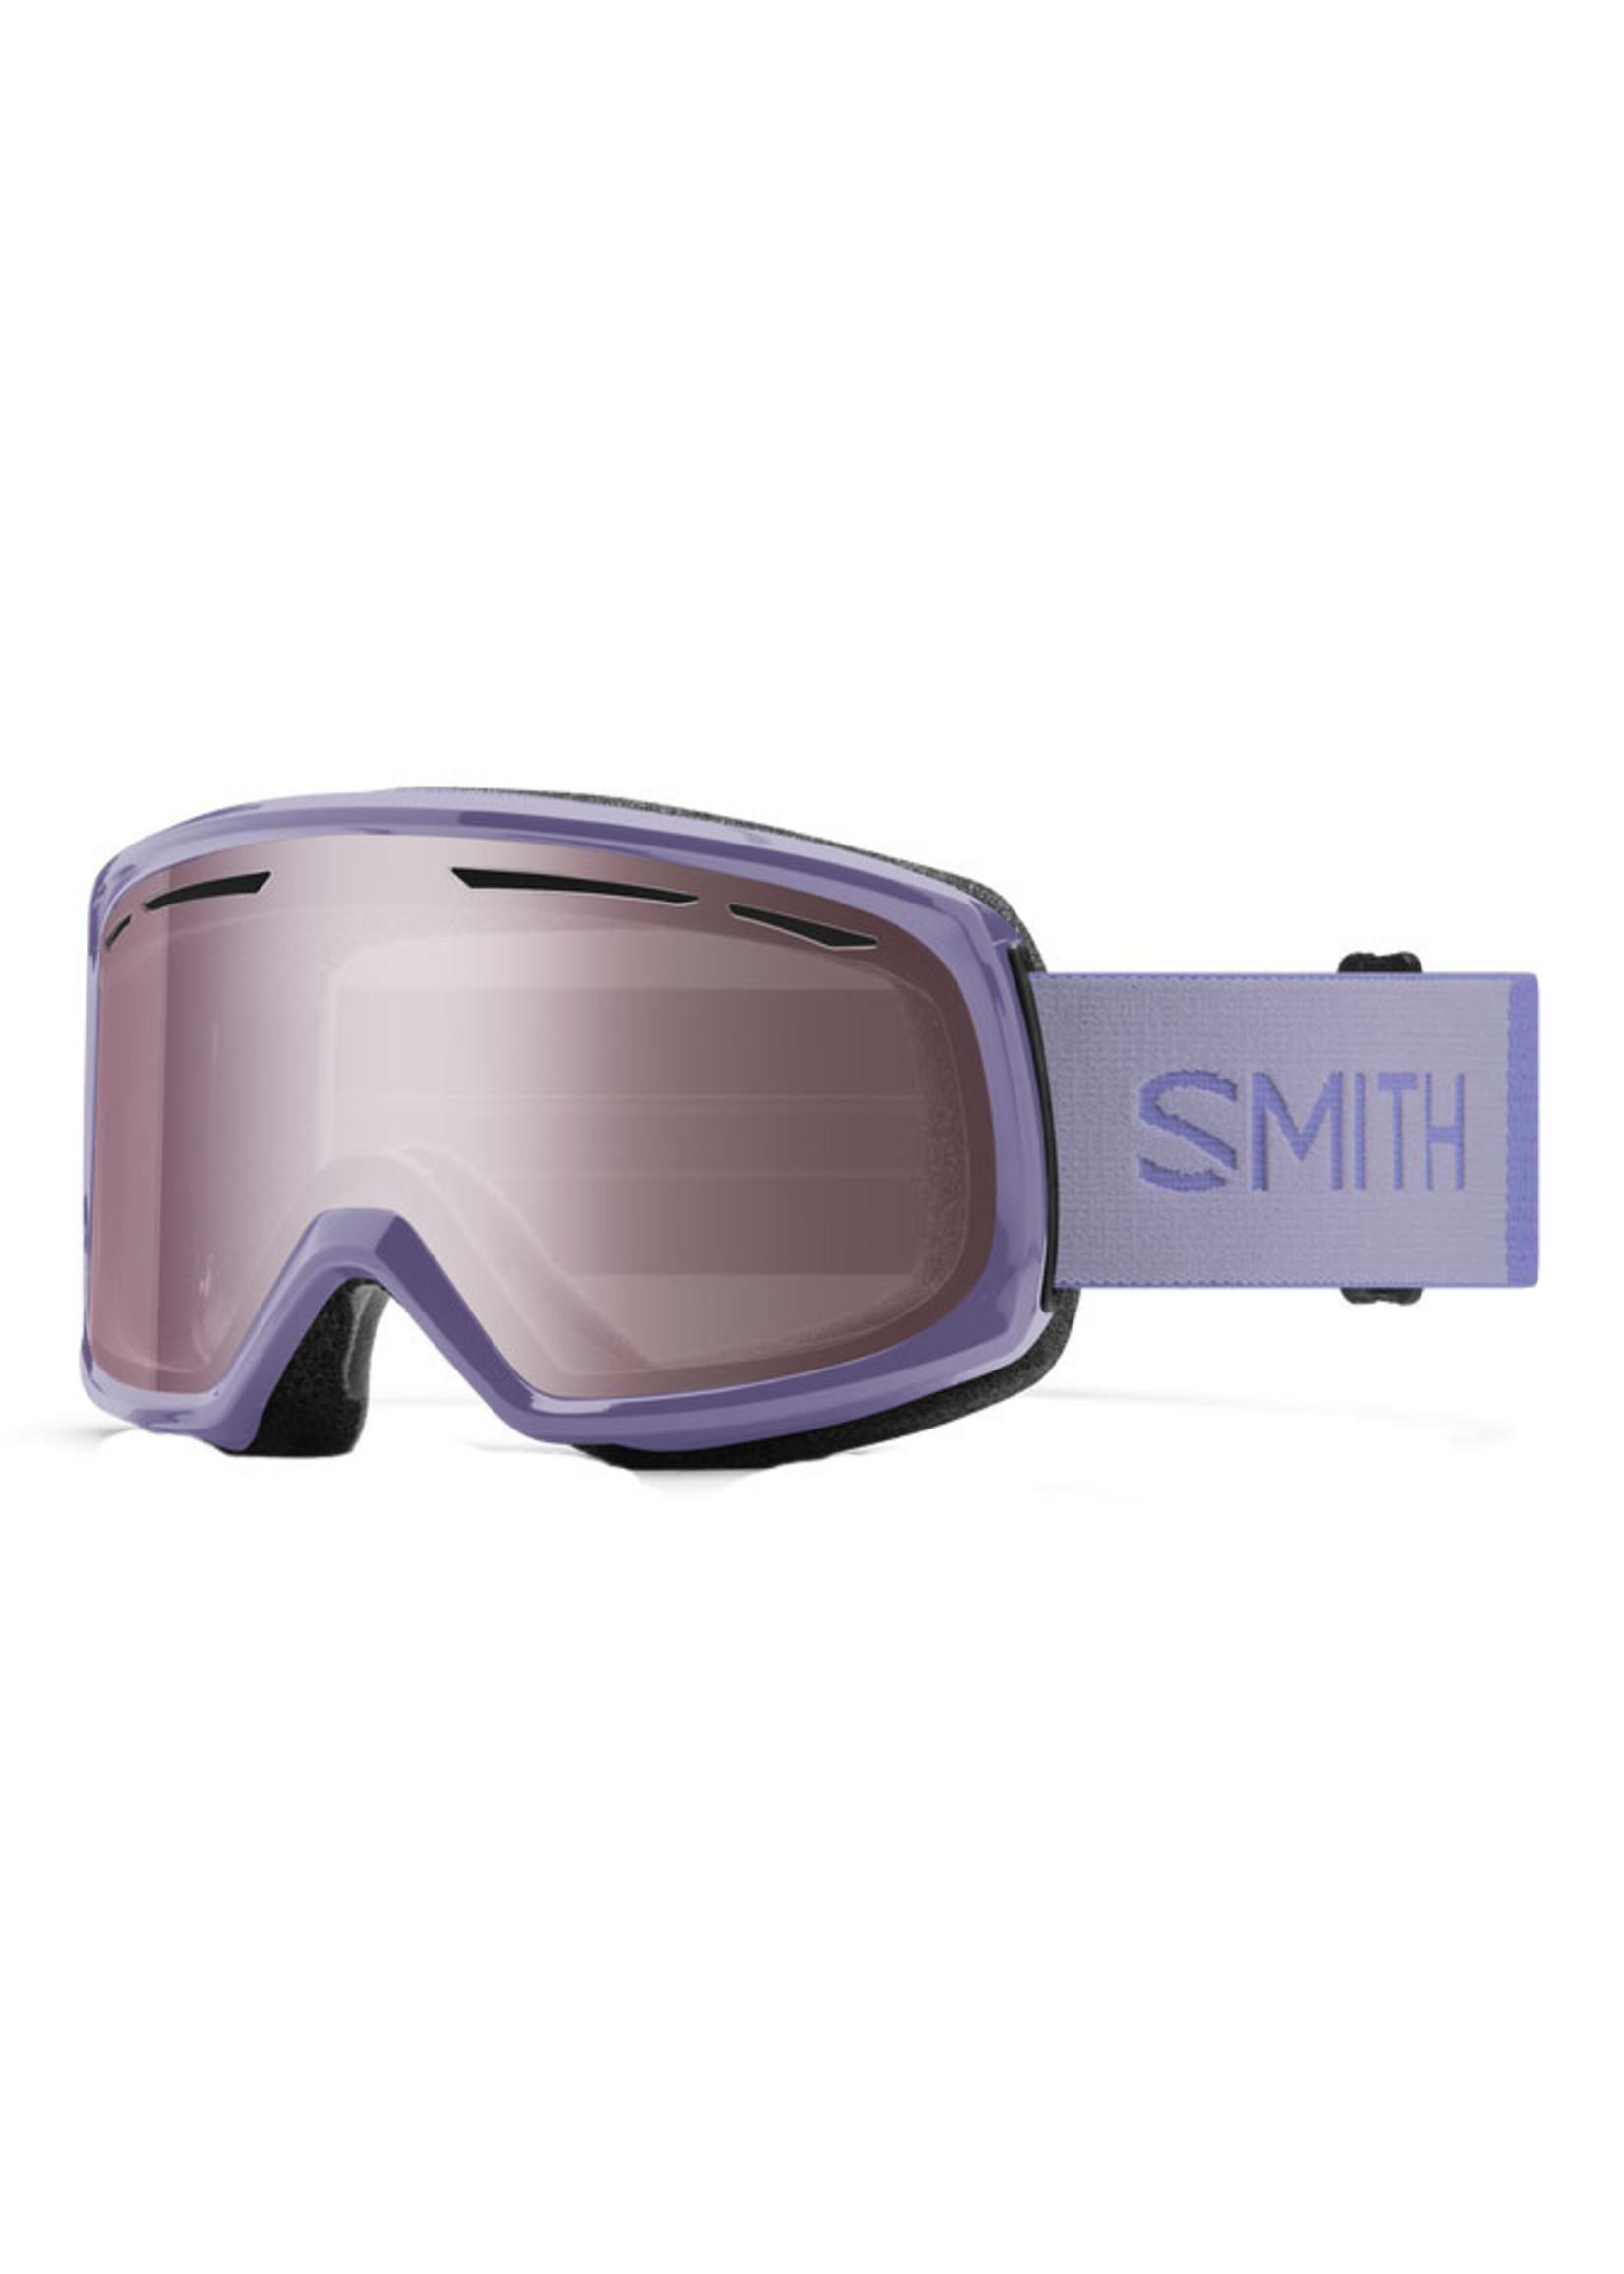 Smith Optics SMITH DRIFT GOGGLE